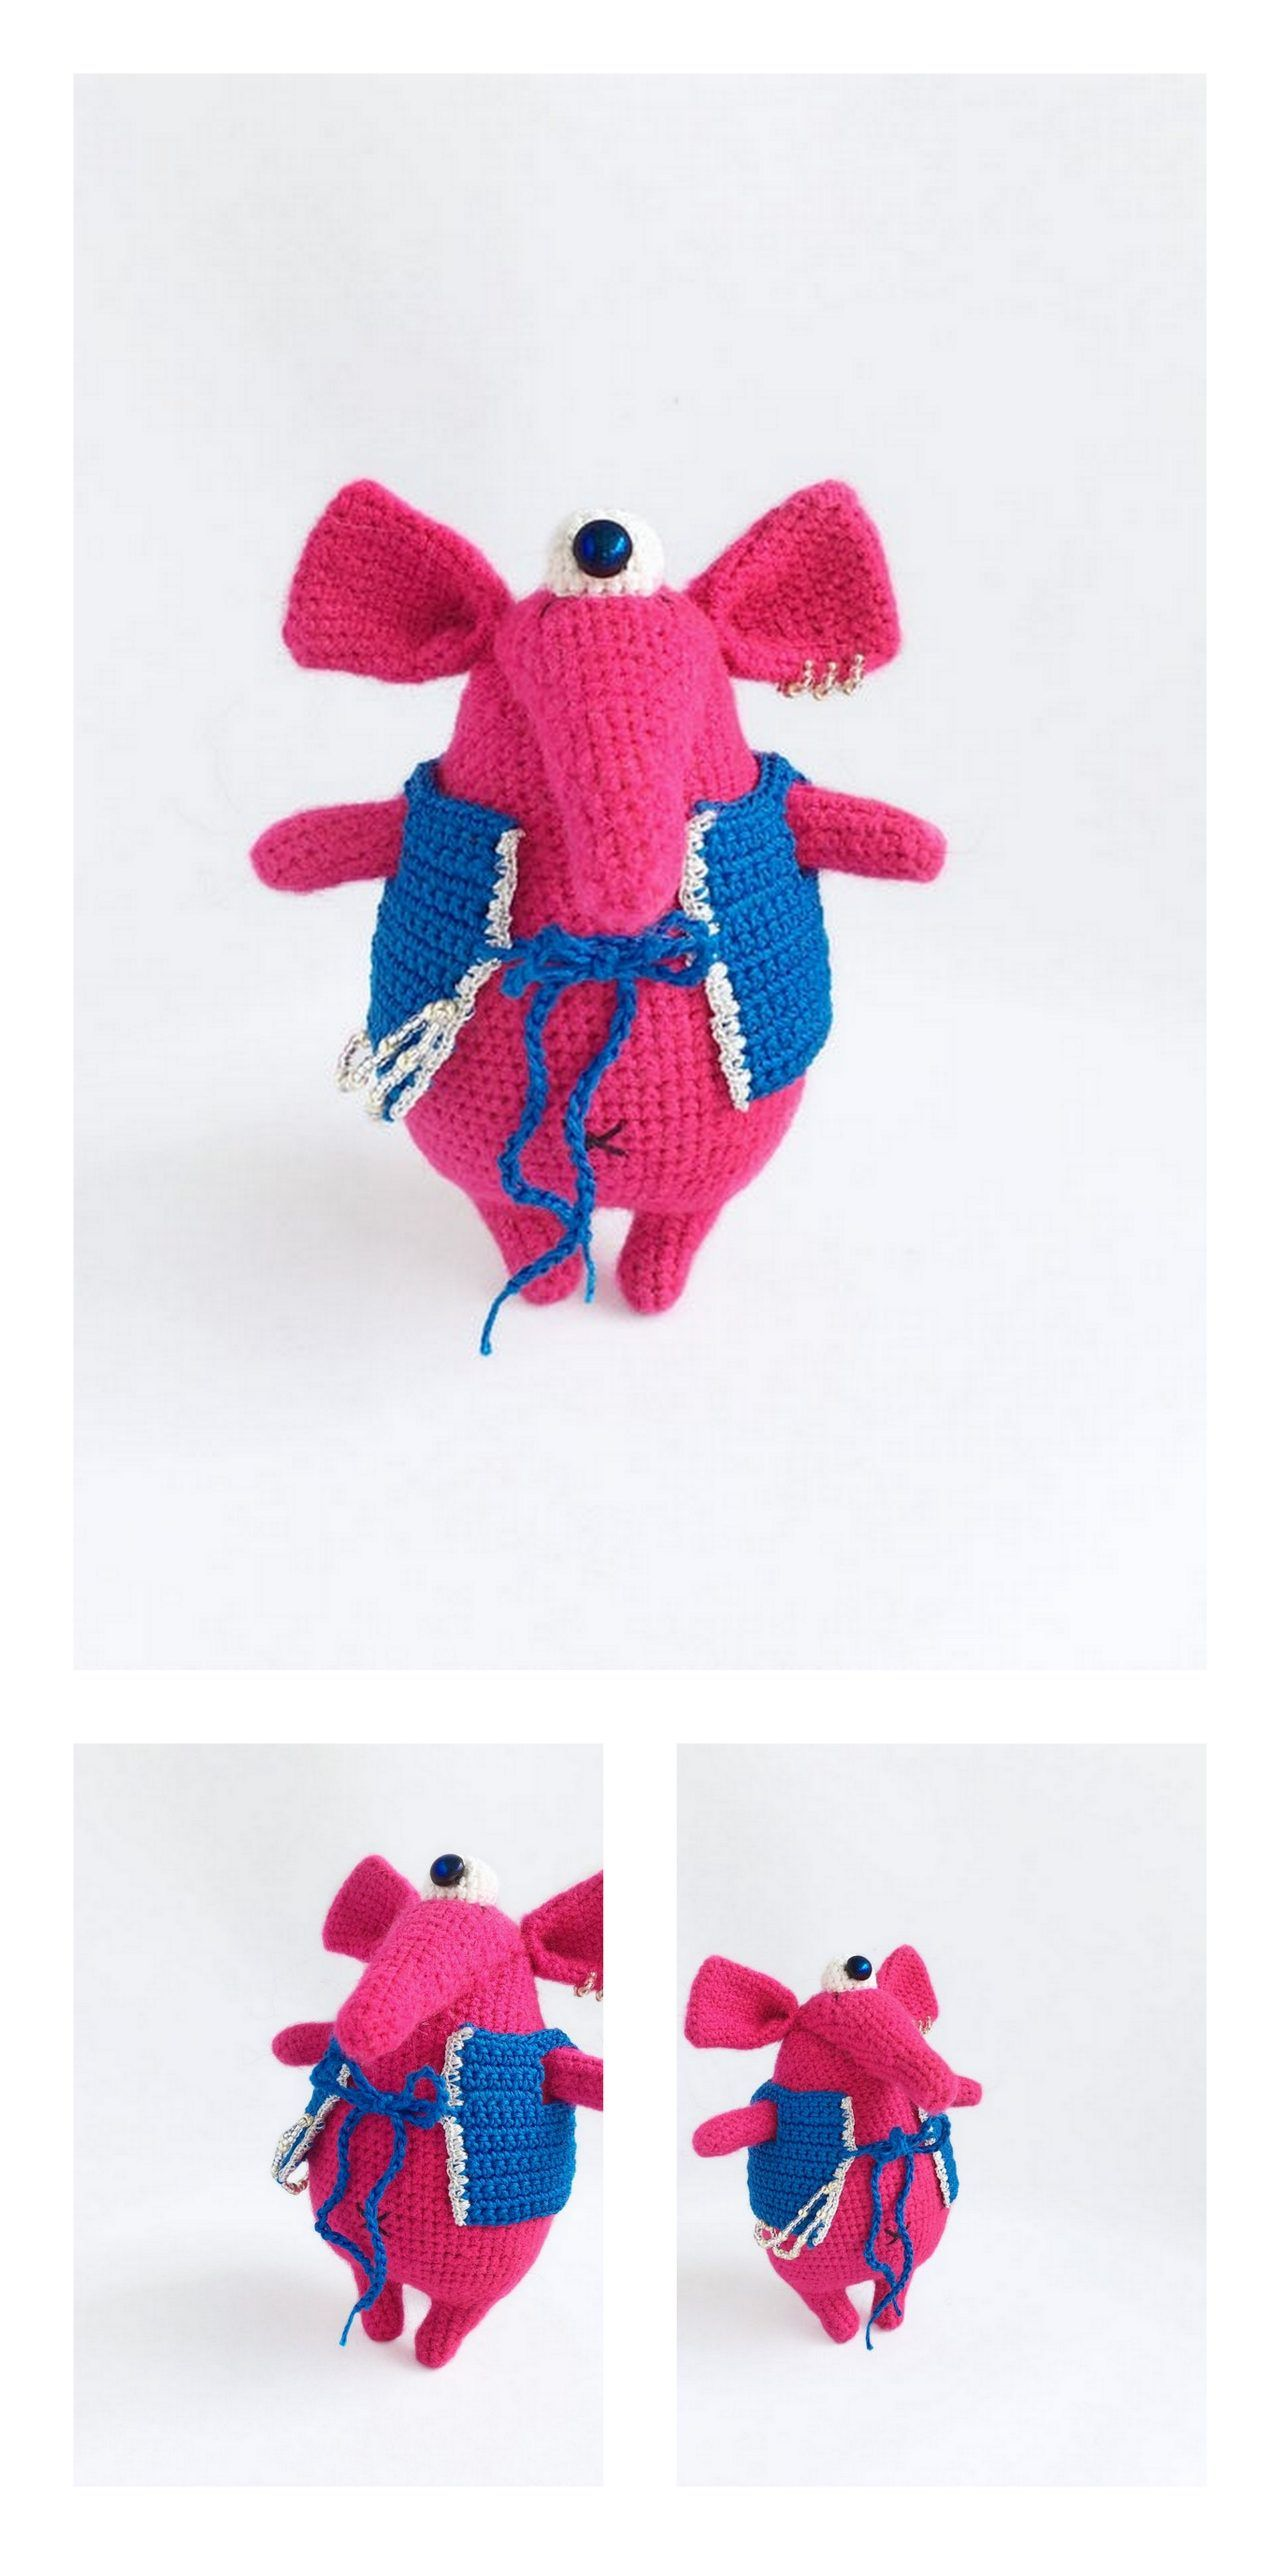 Crochet Pattern Elephant Happy Amigurumi PDF Cute Grey Mint ... | 2560x1280